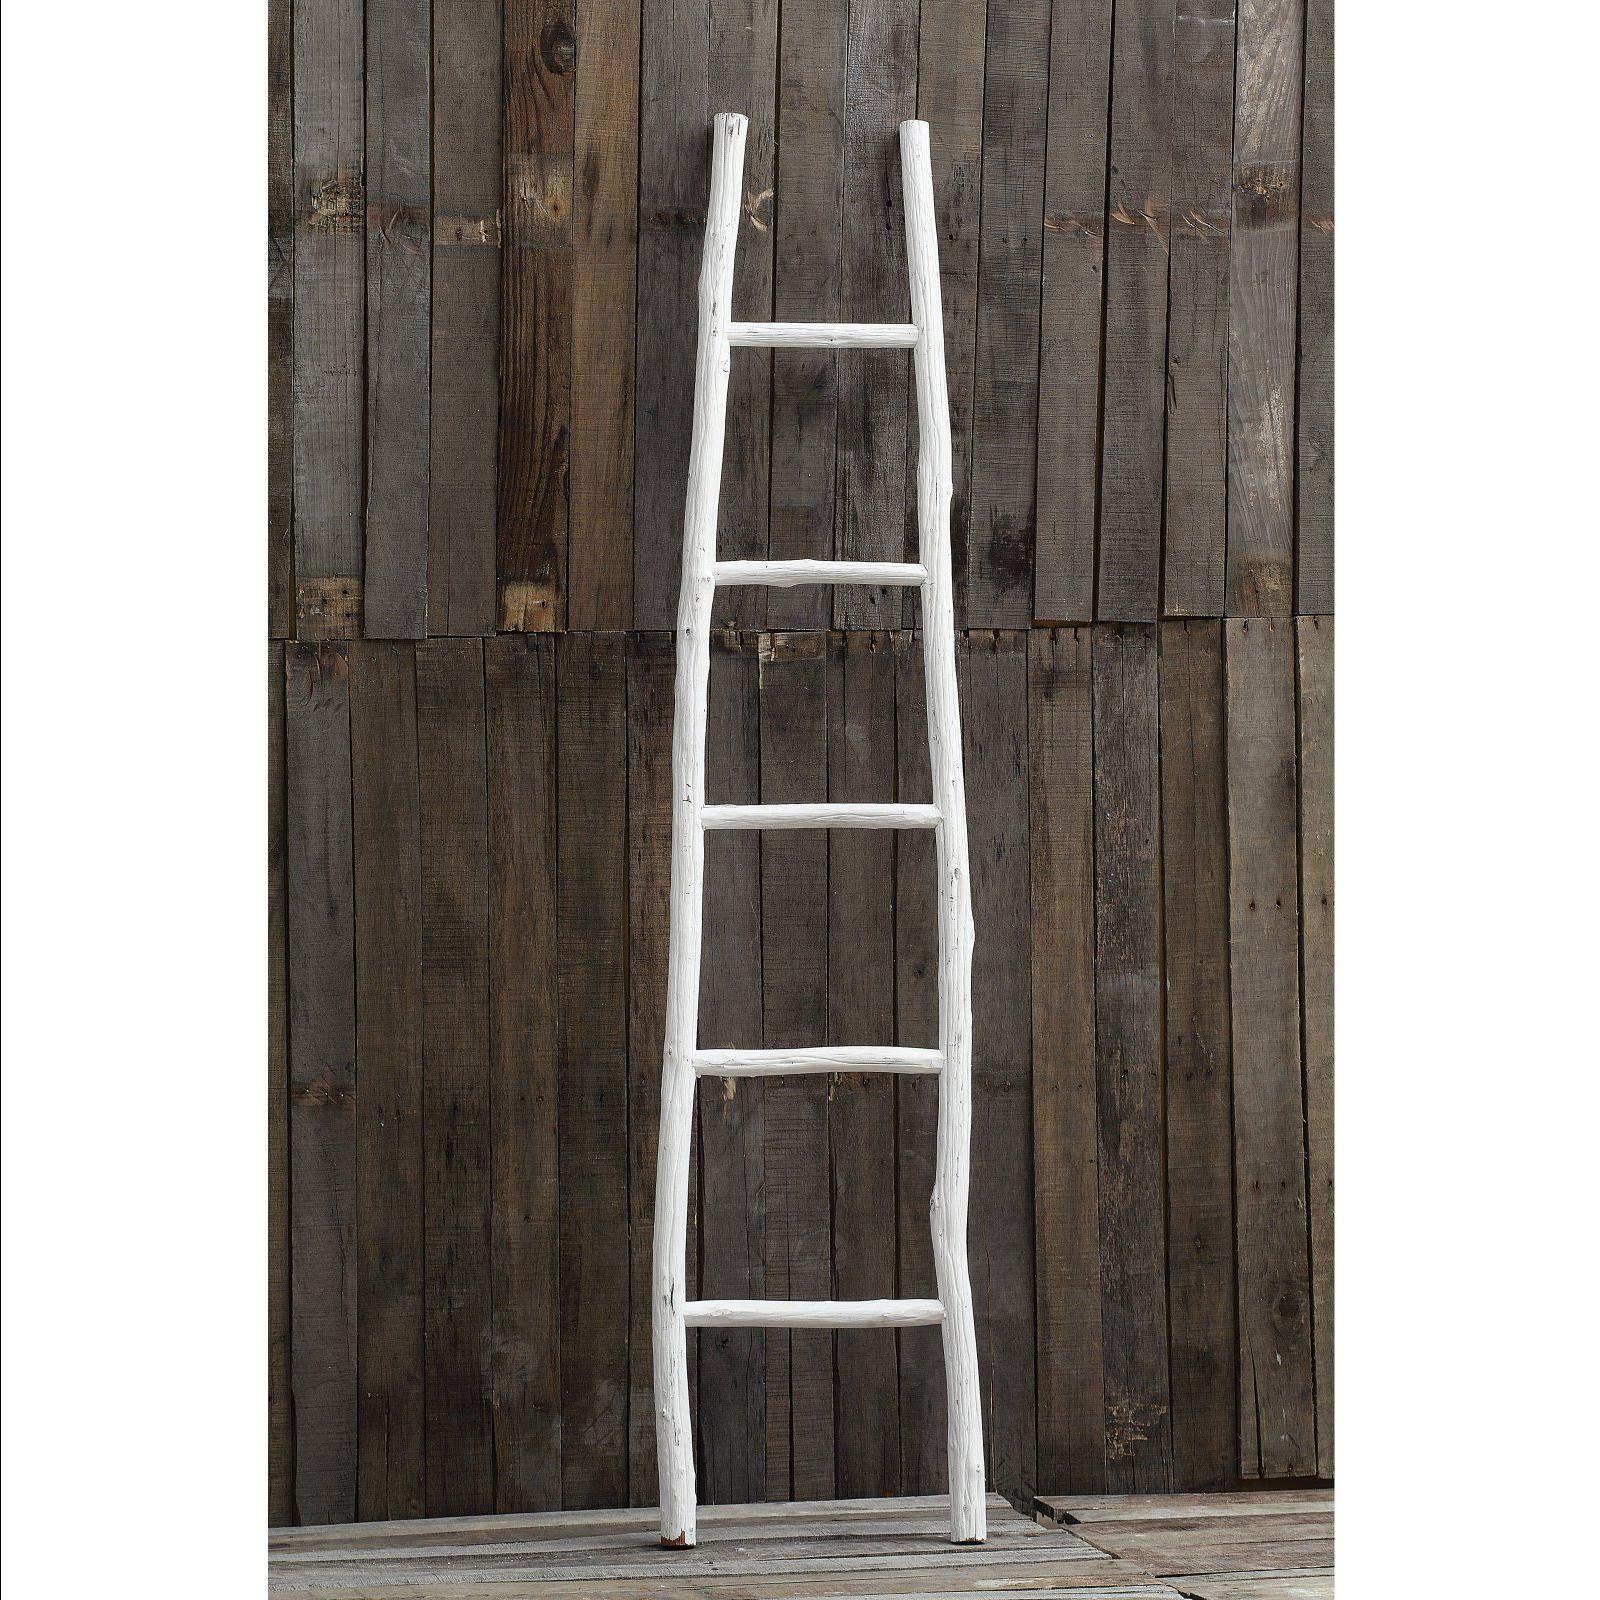 70 in. Decorative Wood Ladder Quilt Rack